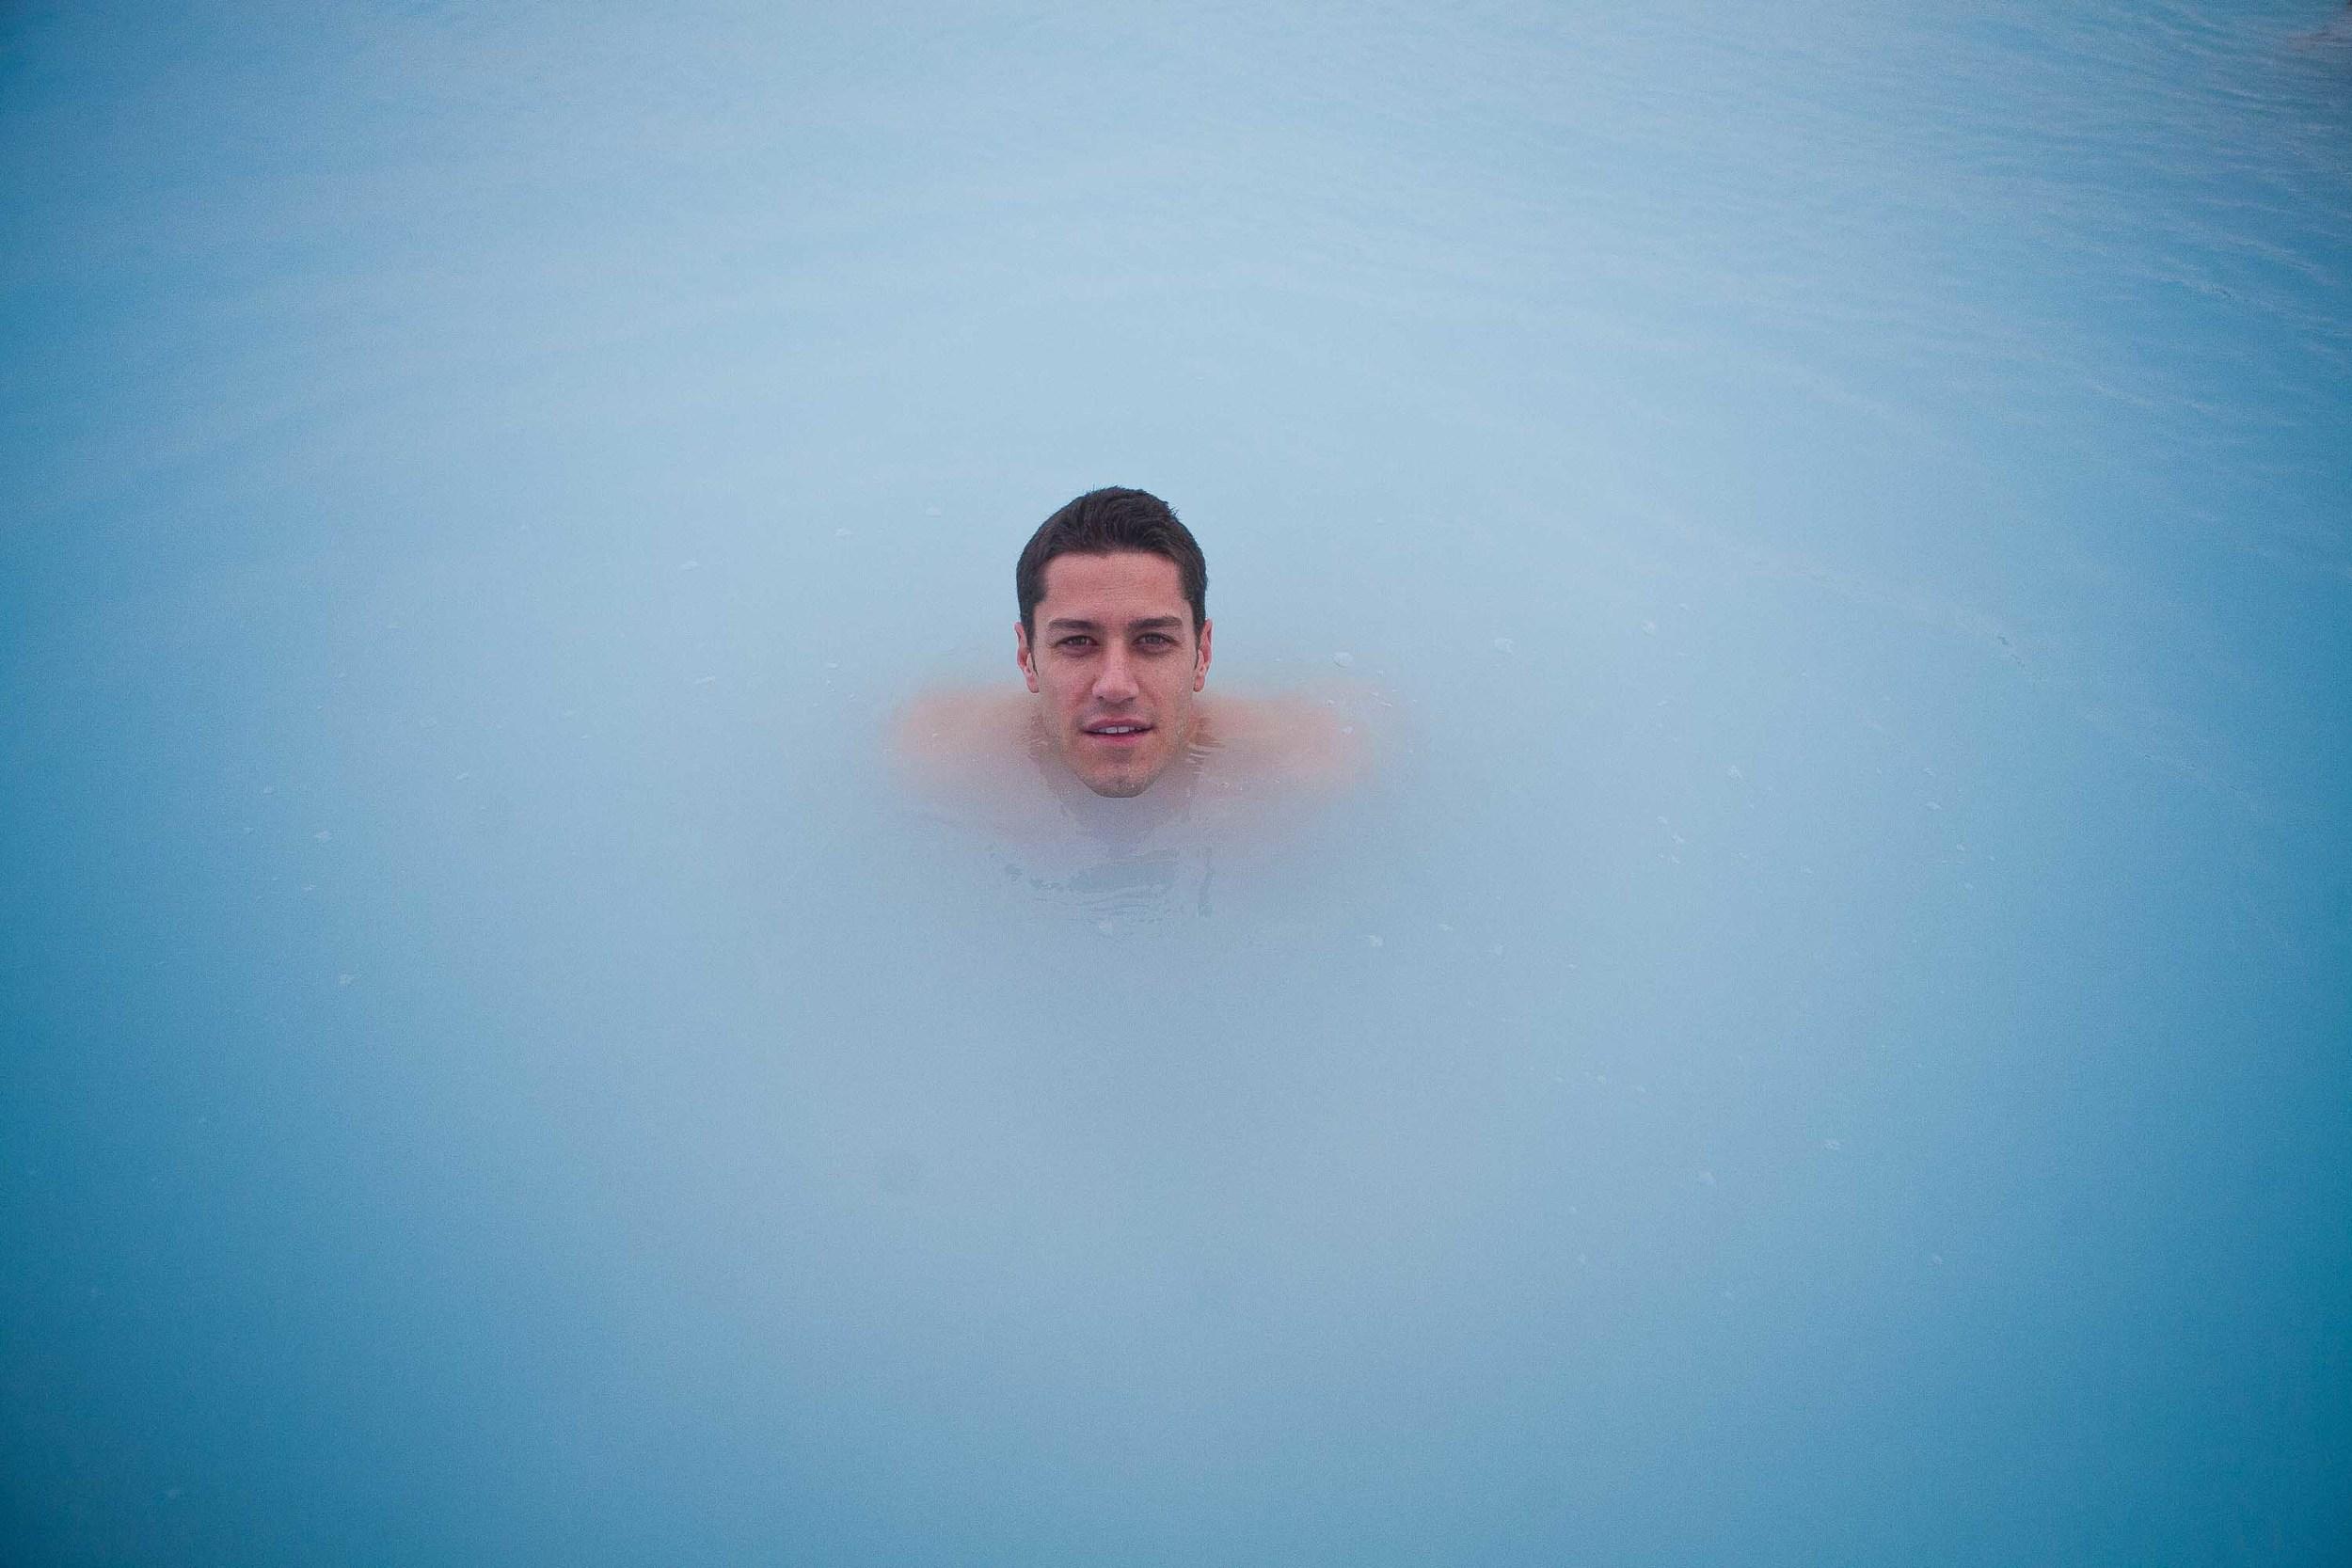 bryce-johnson-photography-actor-world-travel-explorer-photo-17.jpg